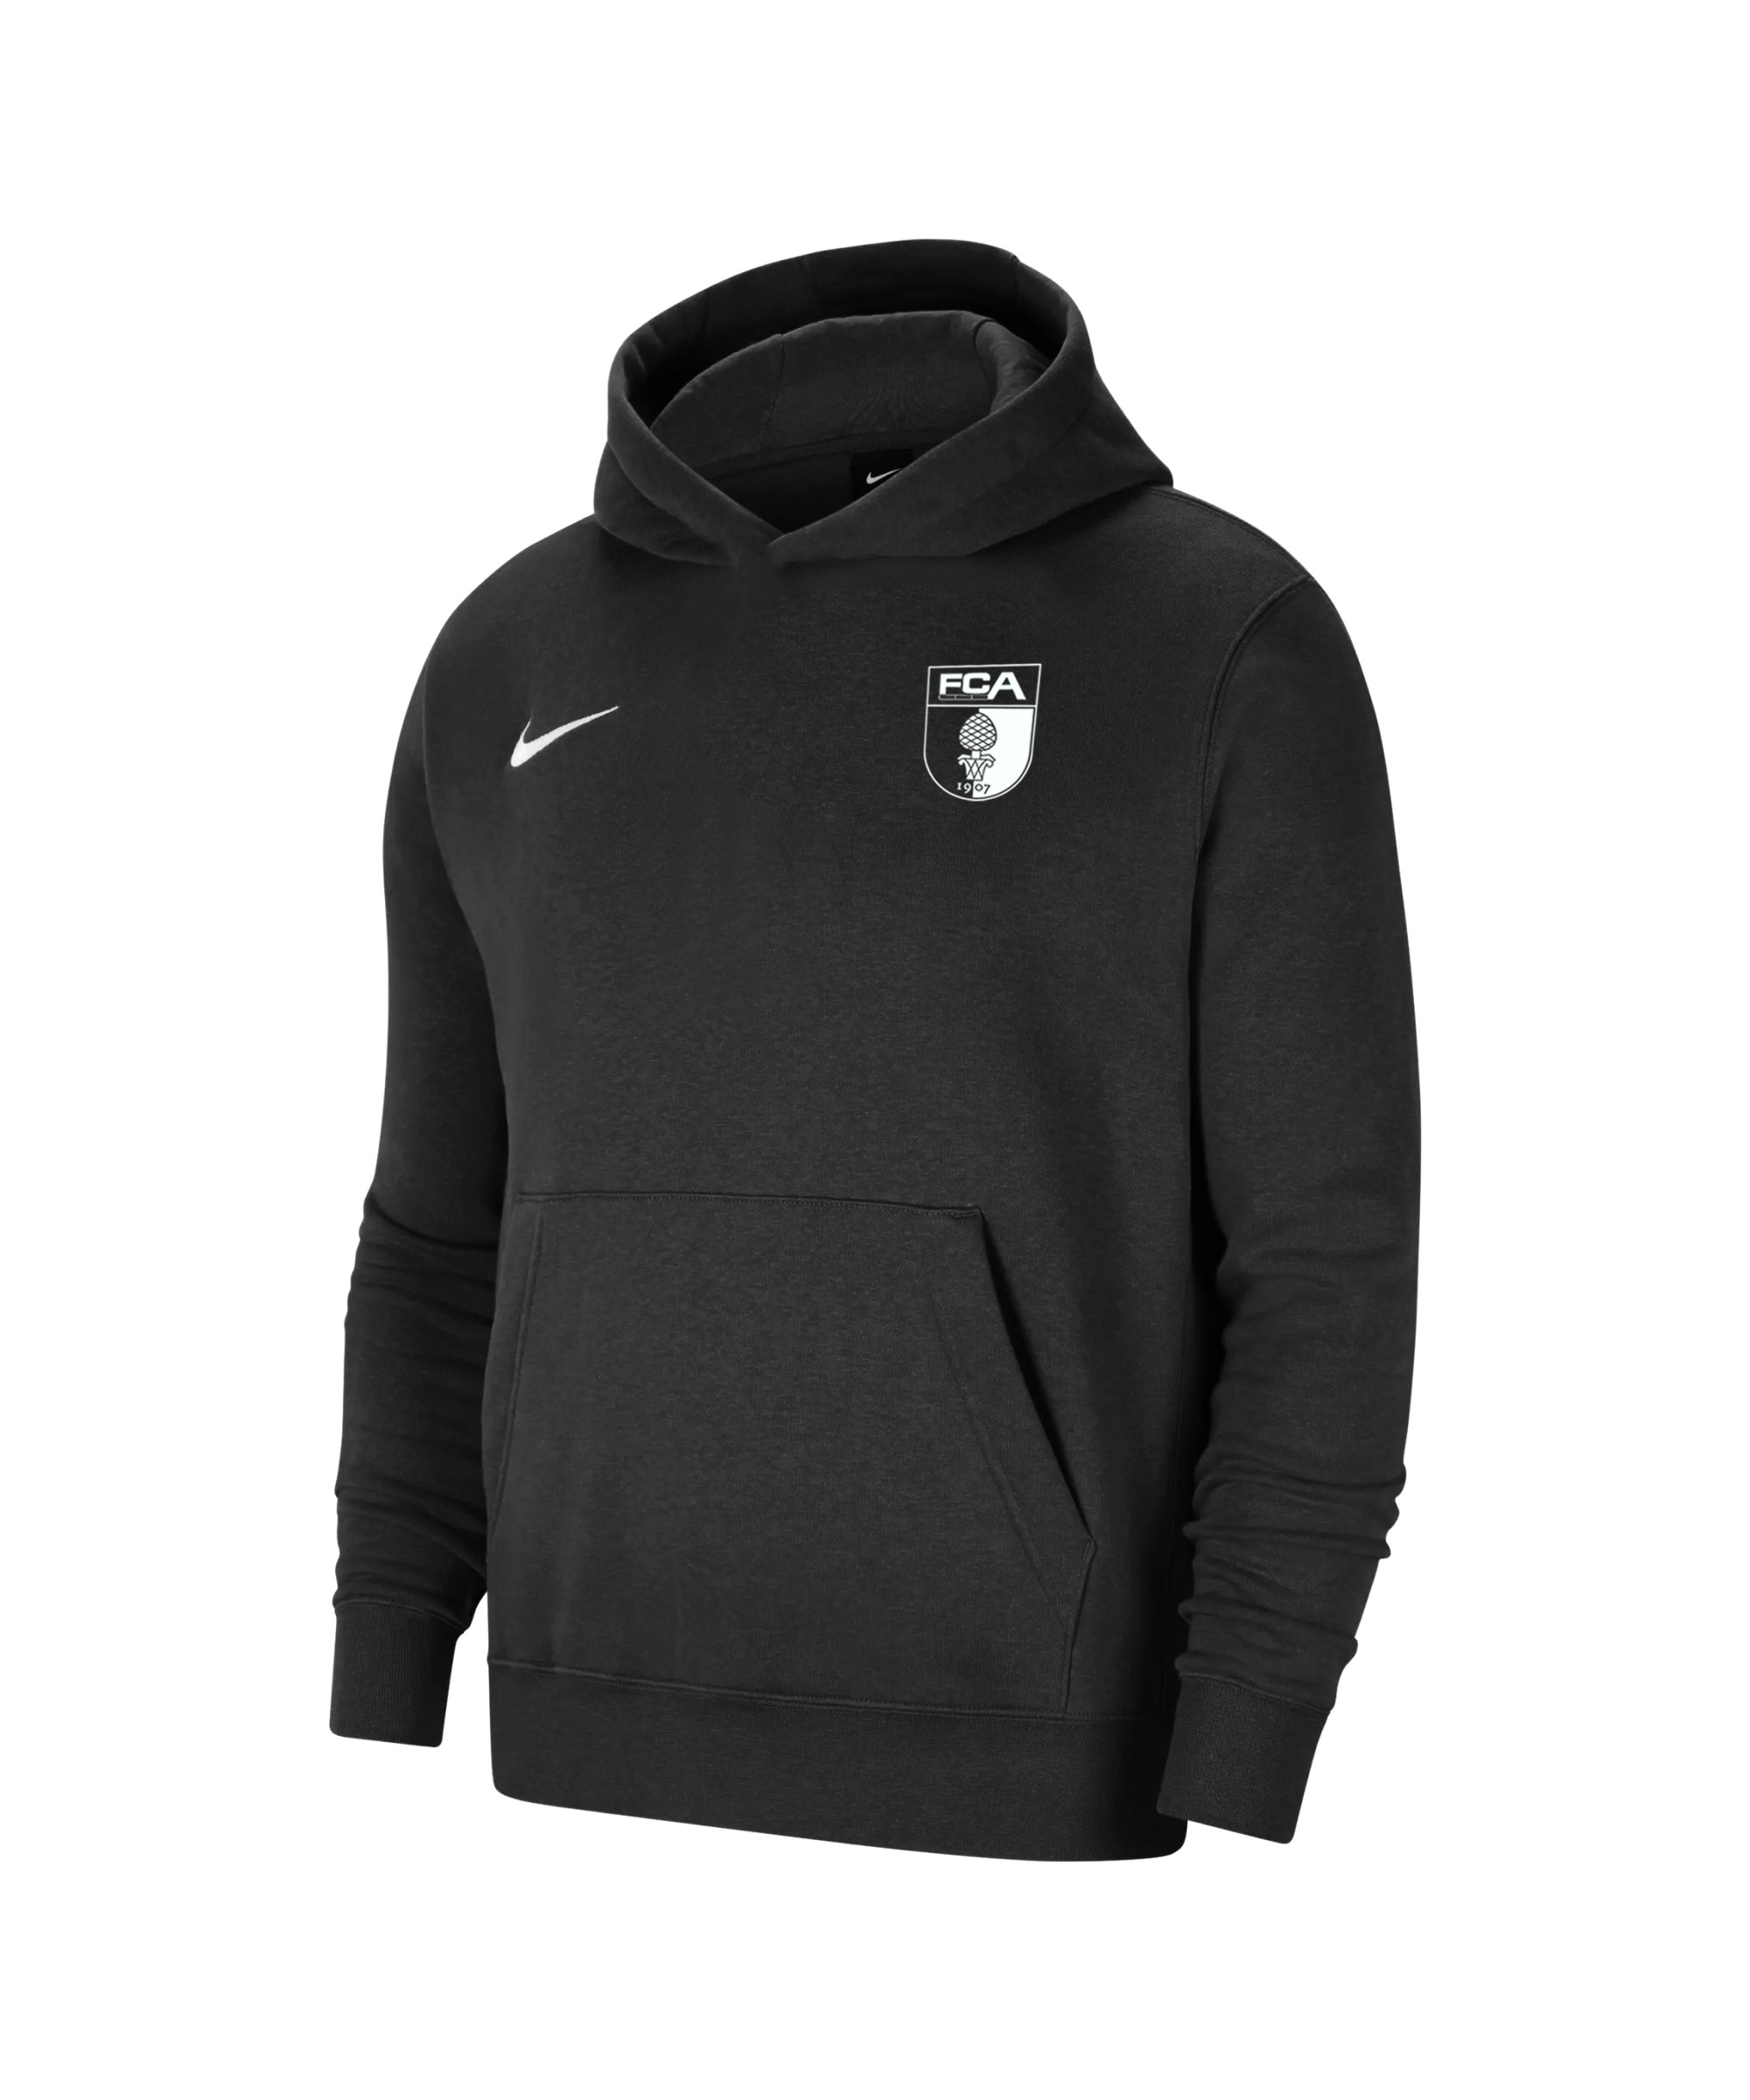 Nike FC Augsburg Fleece Hoody Kids Schwarz F010 - schwarz